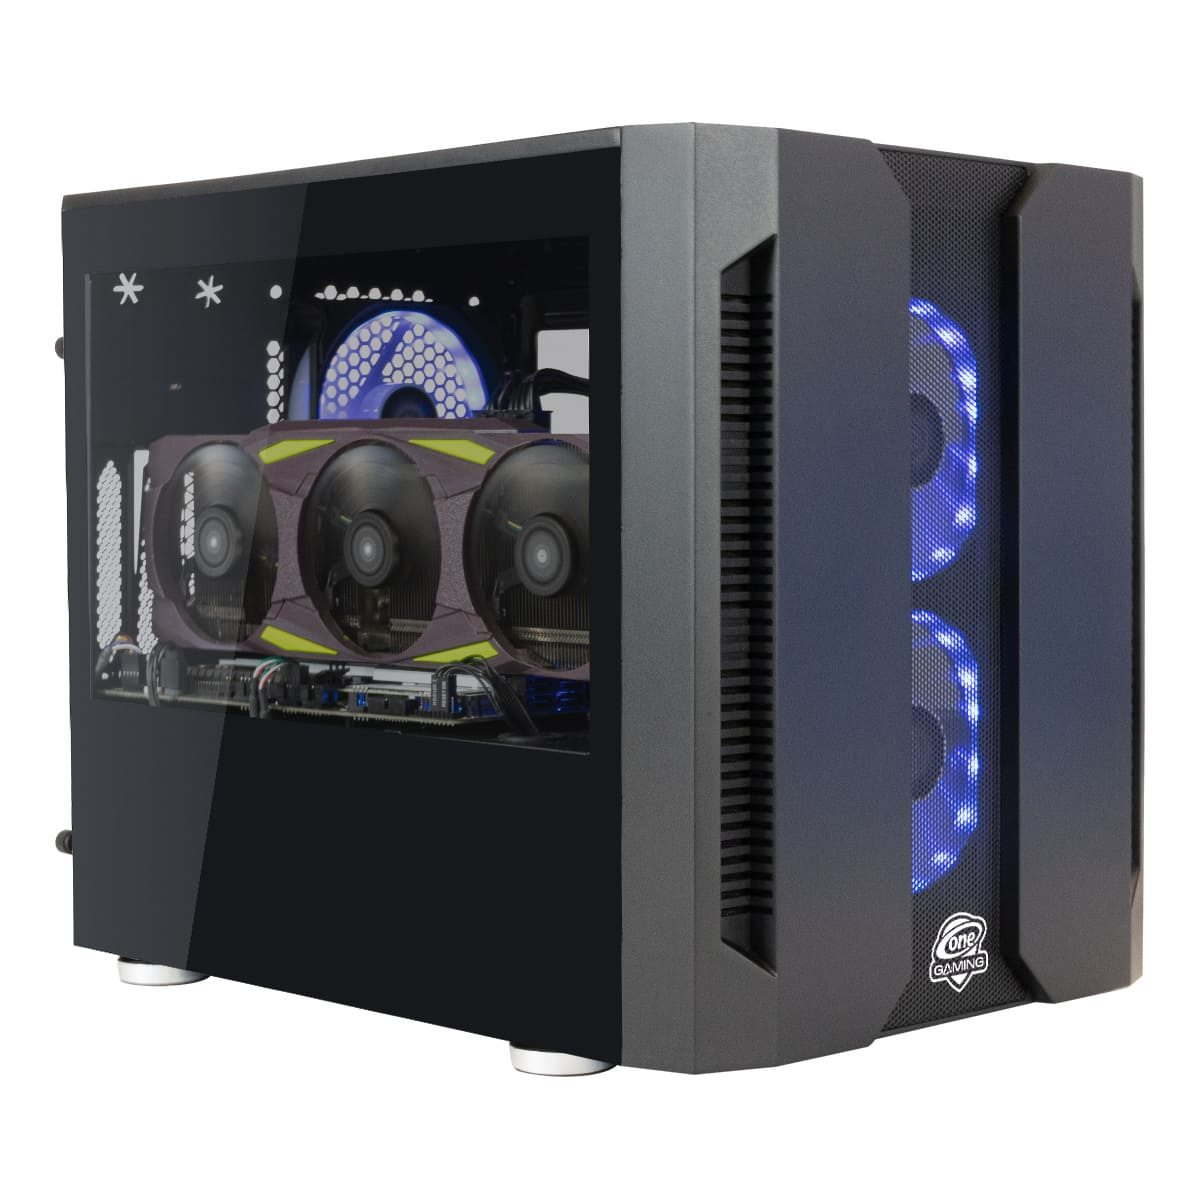 ONE GAMING Mini PC